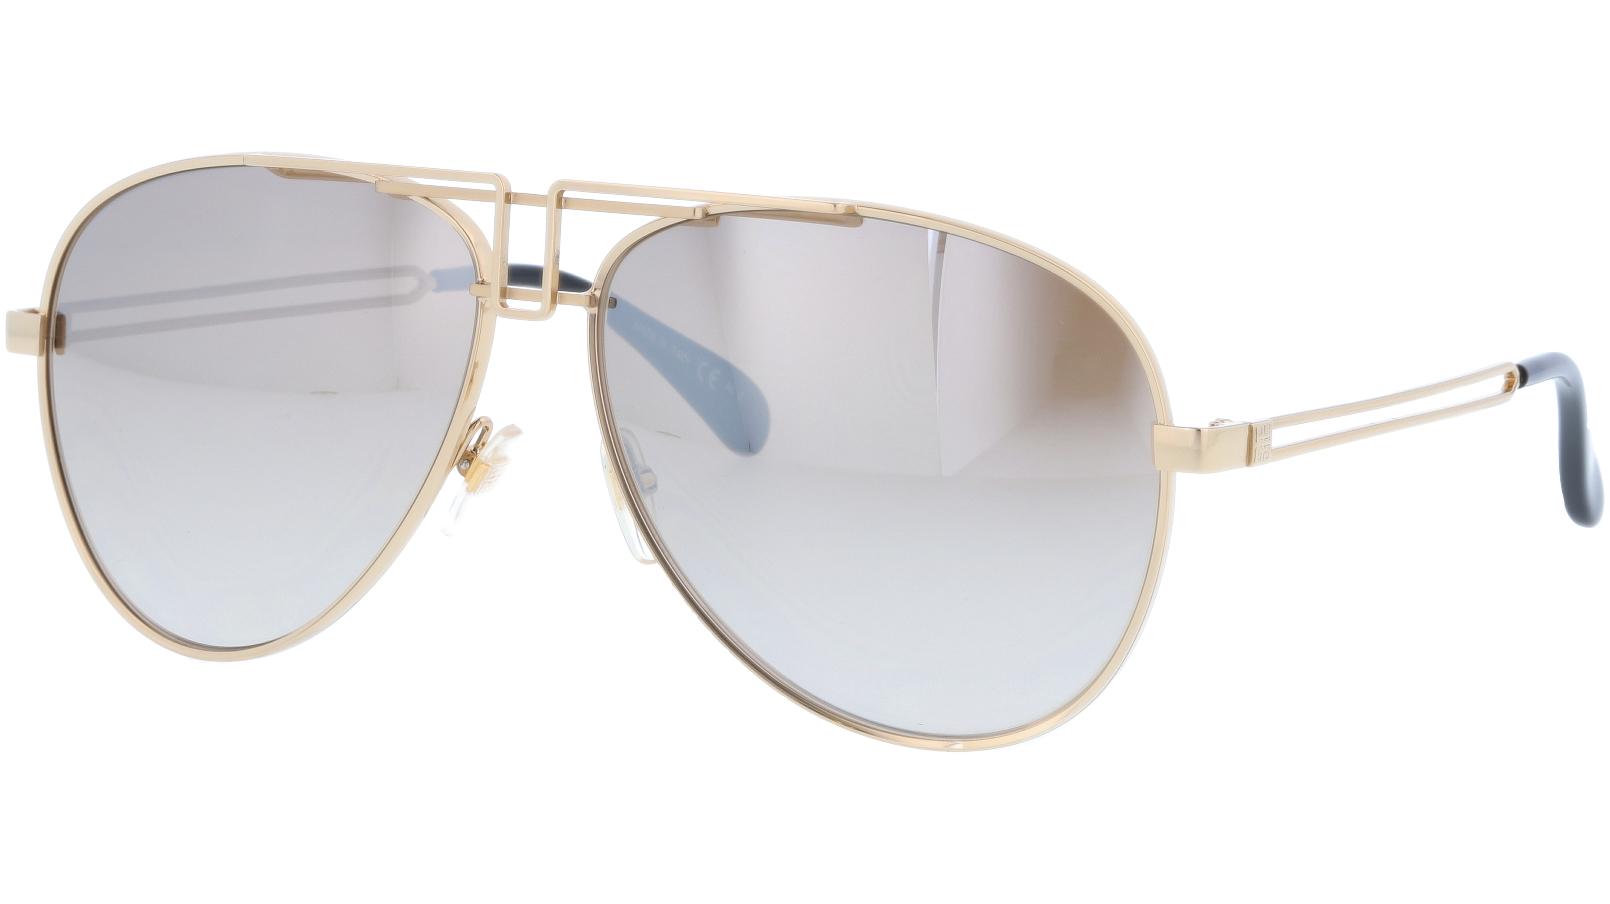 Givenchy GV7110S 010UE 61 Palladium Sunglasses